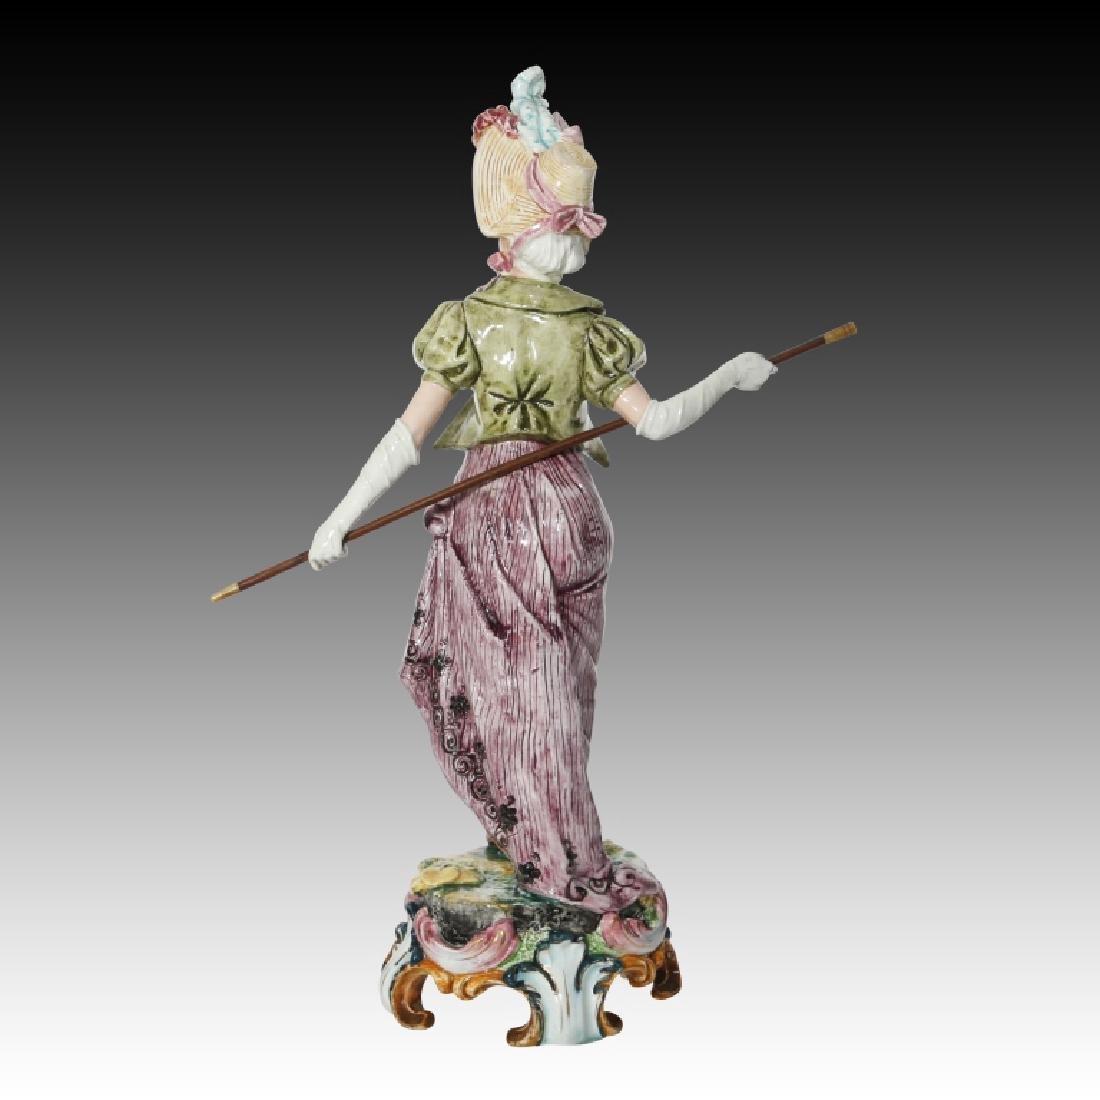 Majolica Figural Pair of Women in Regency Dress - 5